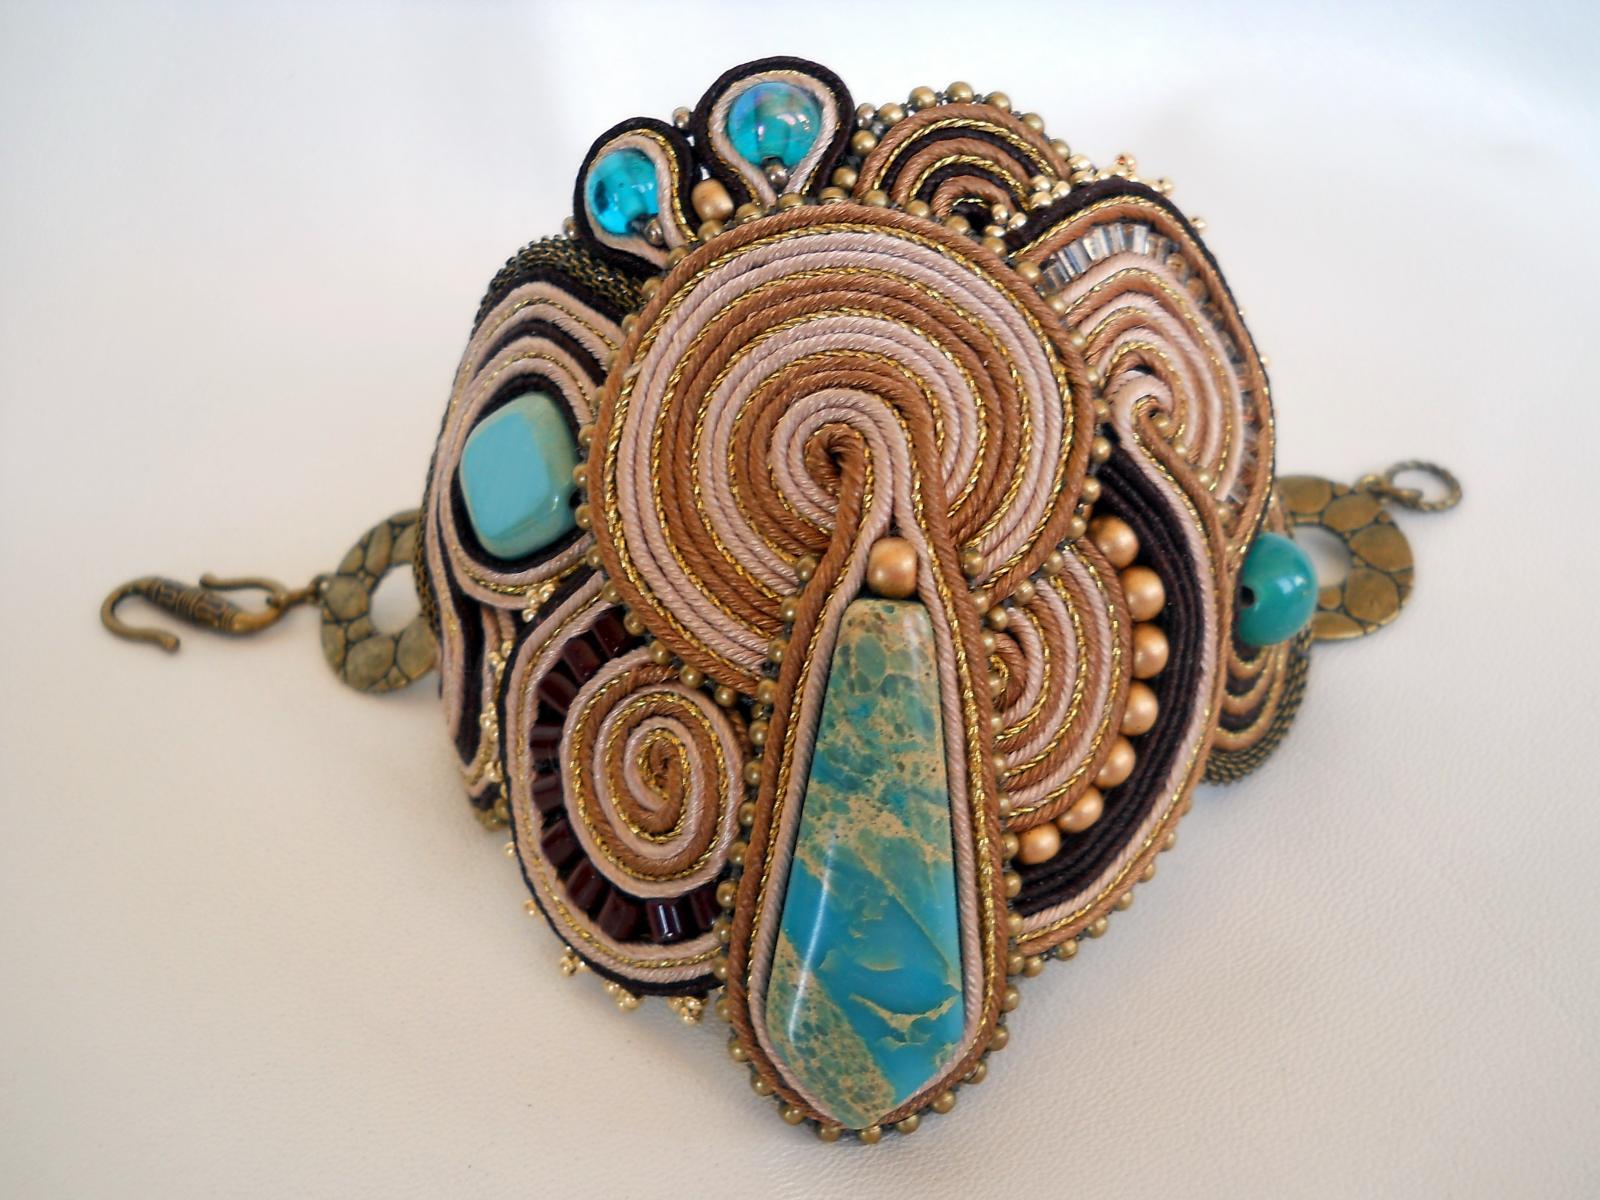 Египетский браслет. Мастер-класс